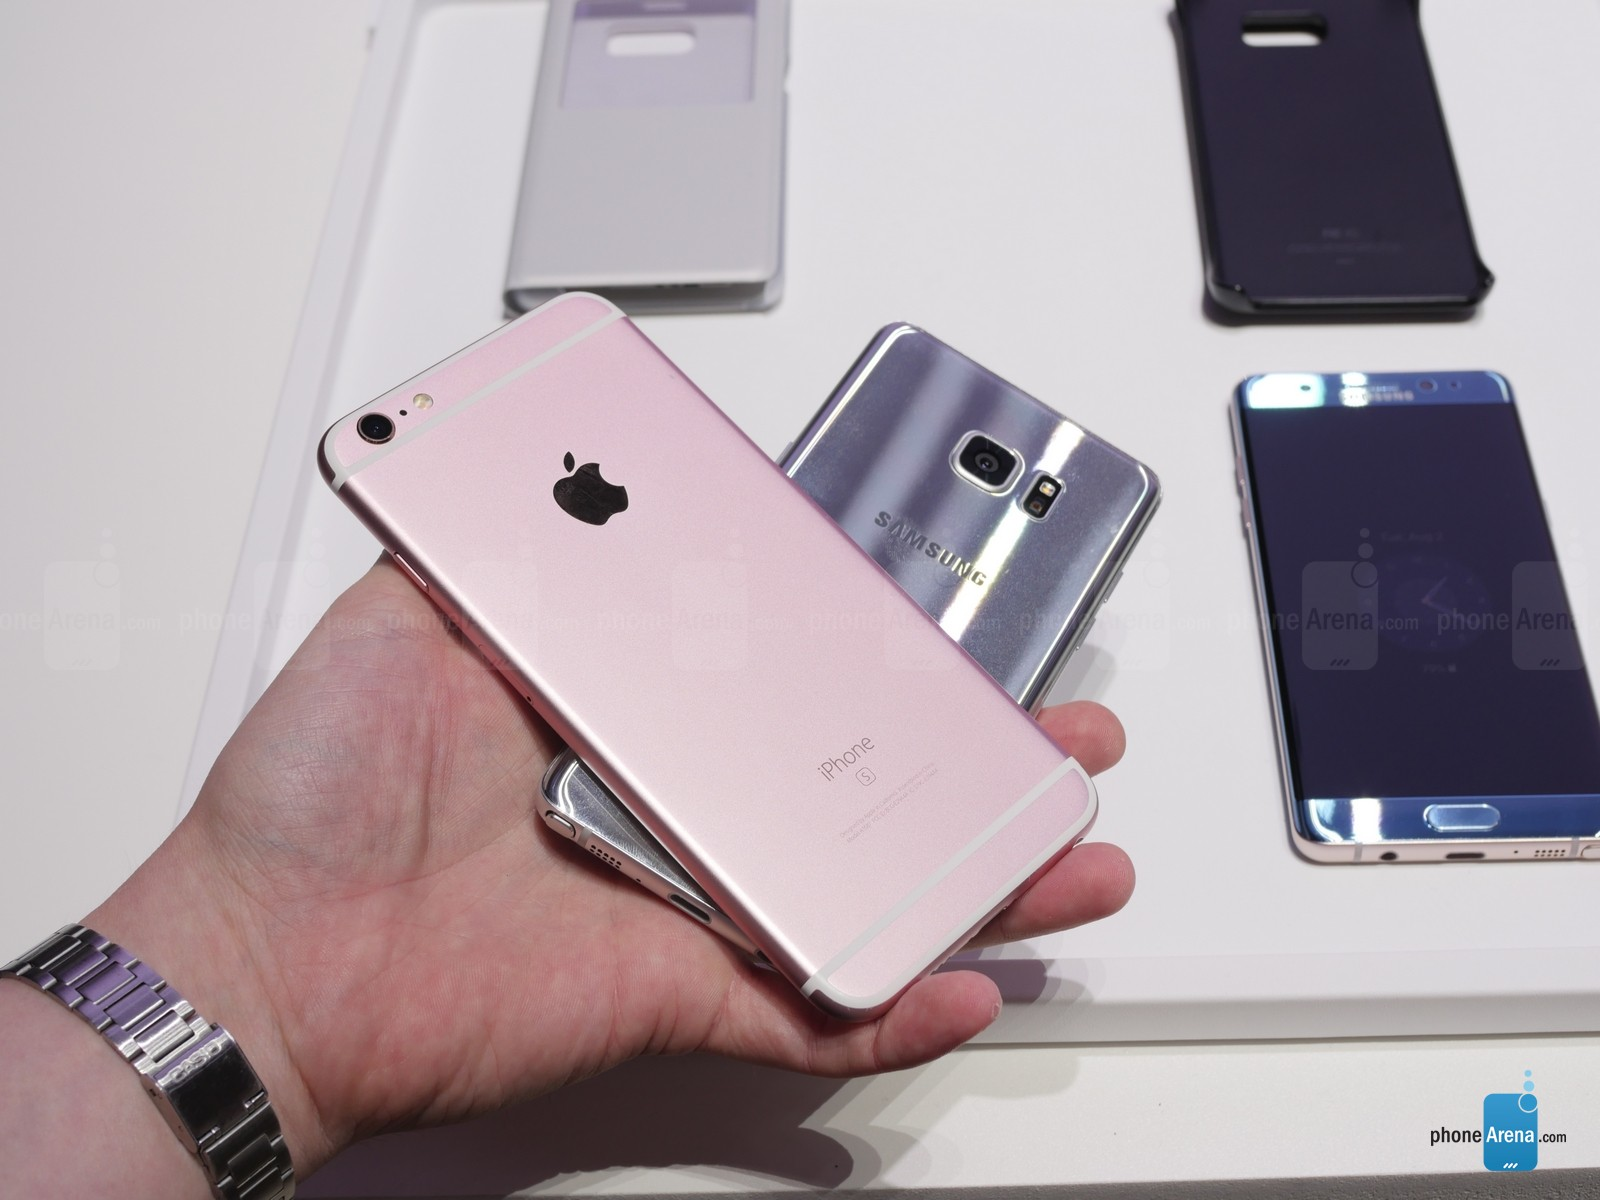 Samsung-Galaxy-Note-7-vs-Apple-iPhongfe-6s-Plus